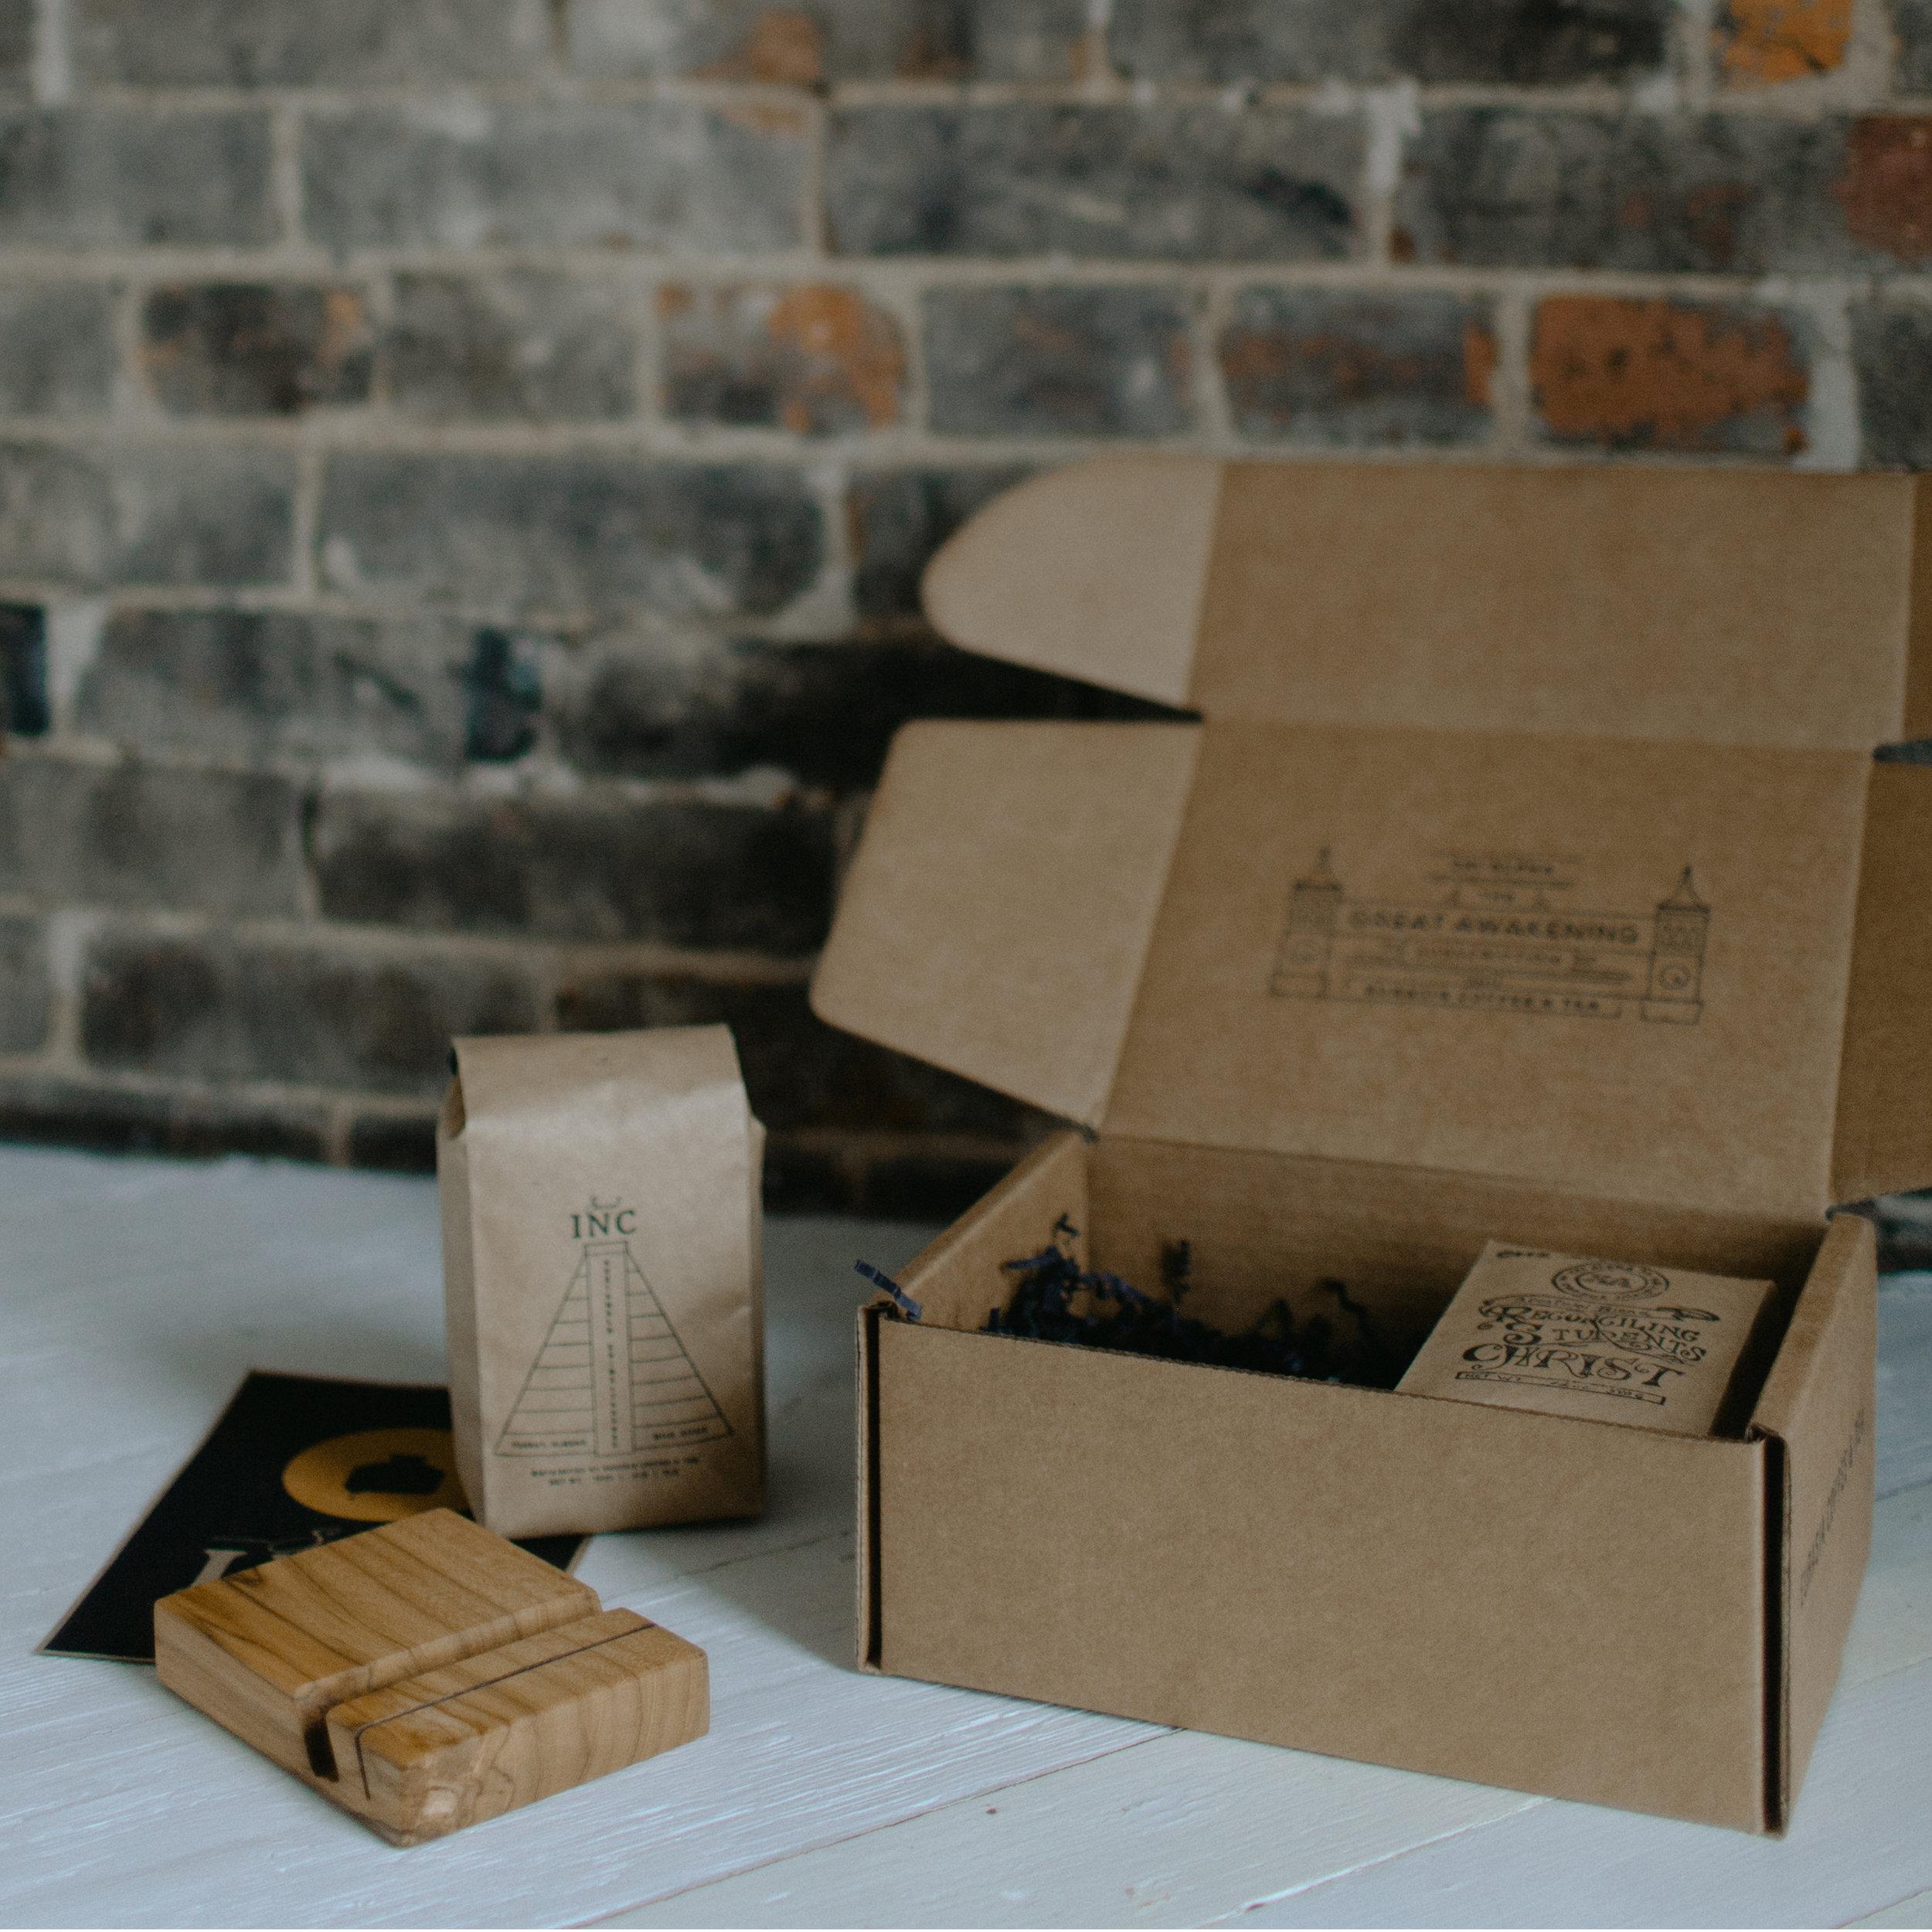 Box 3: Social INC